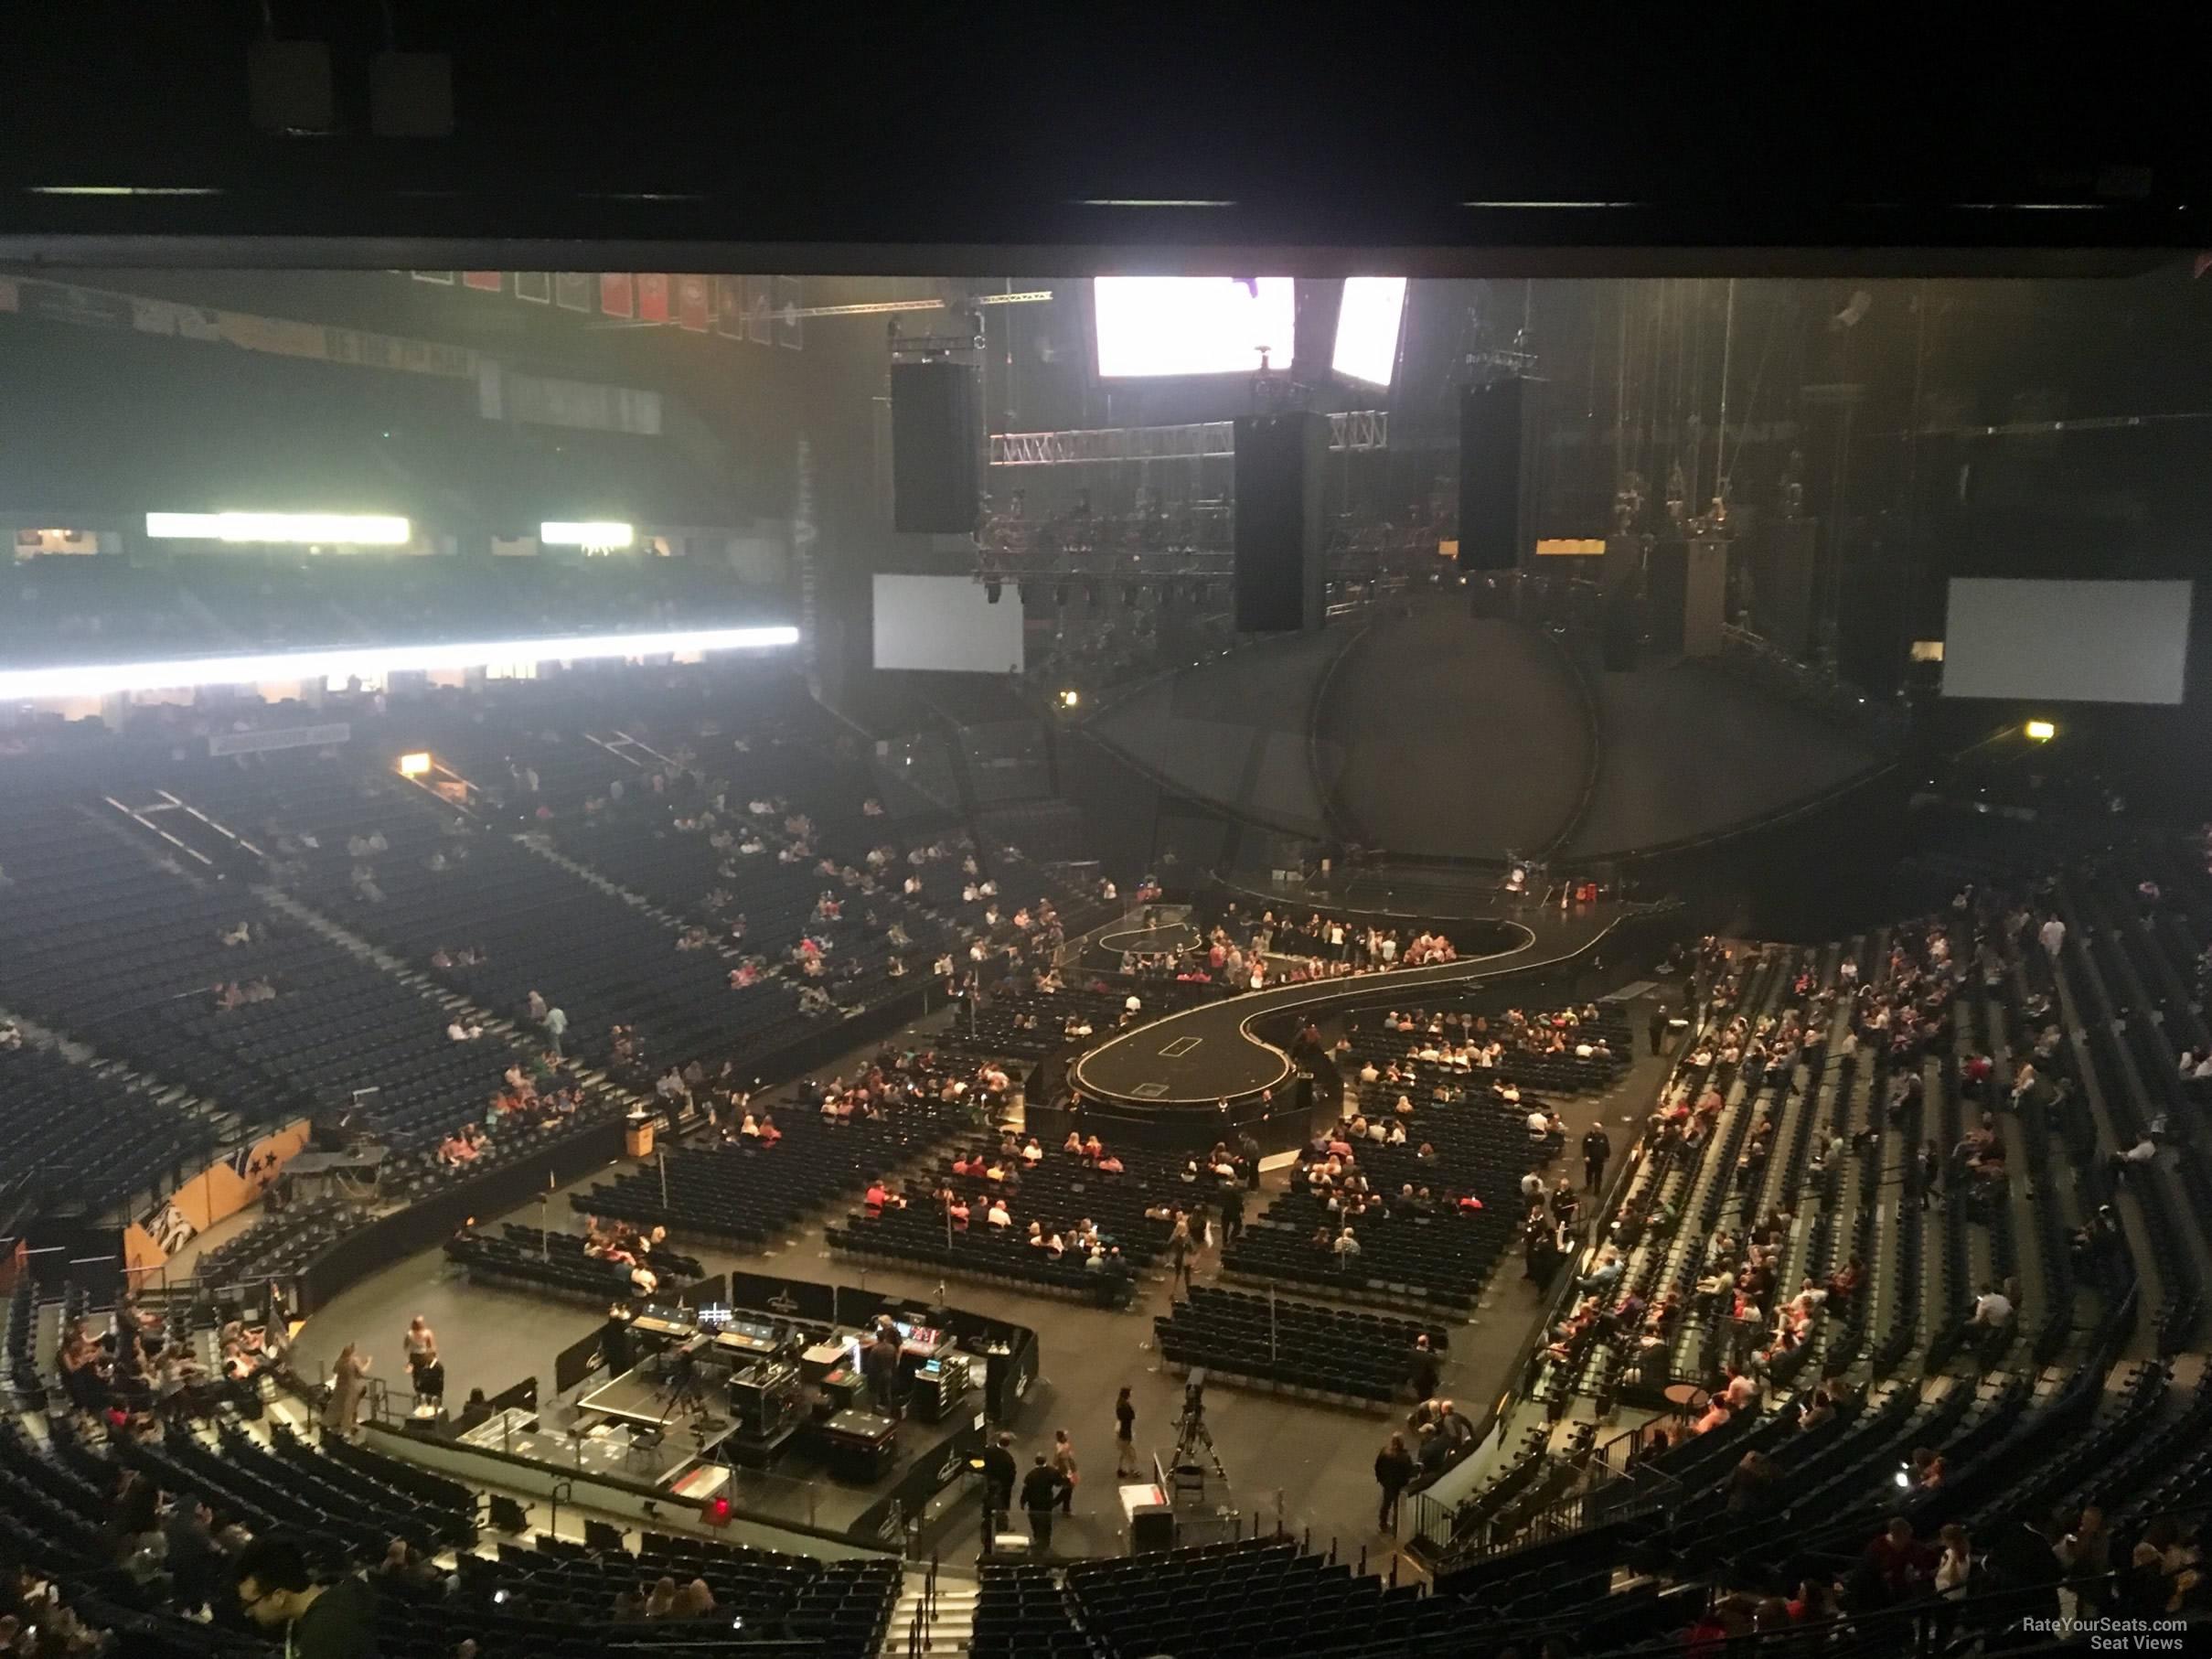 Bridgestone Arena Seating Chart By Row >> Bridgestone Arena Section 203 Concert Seating - RateYourSeats.com